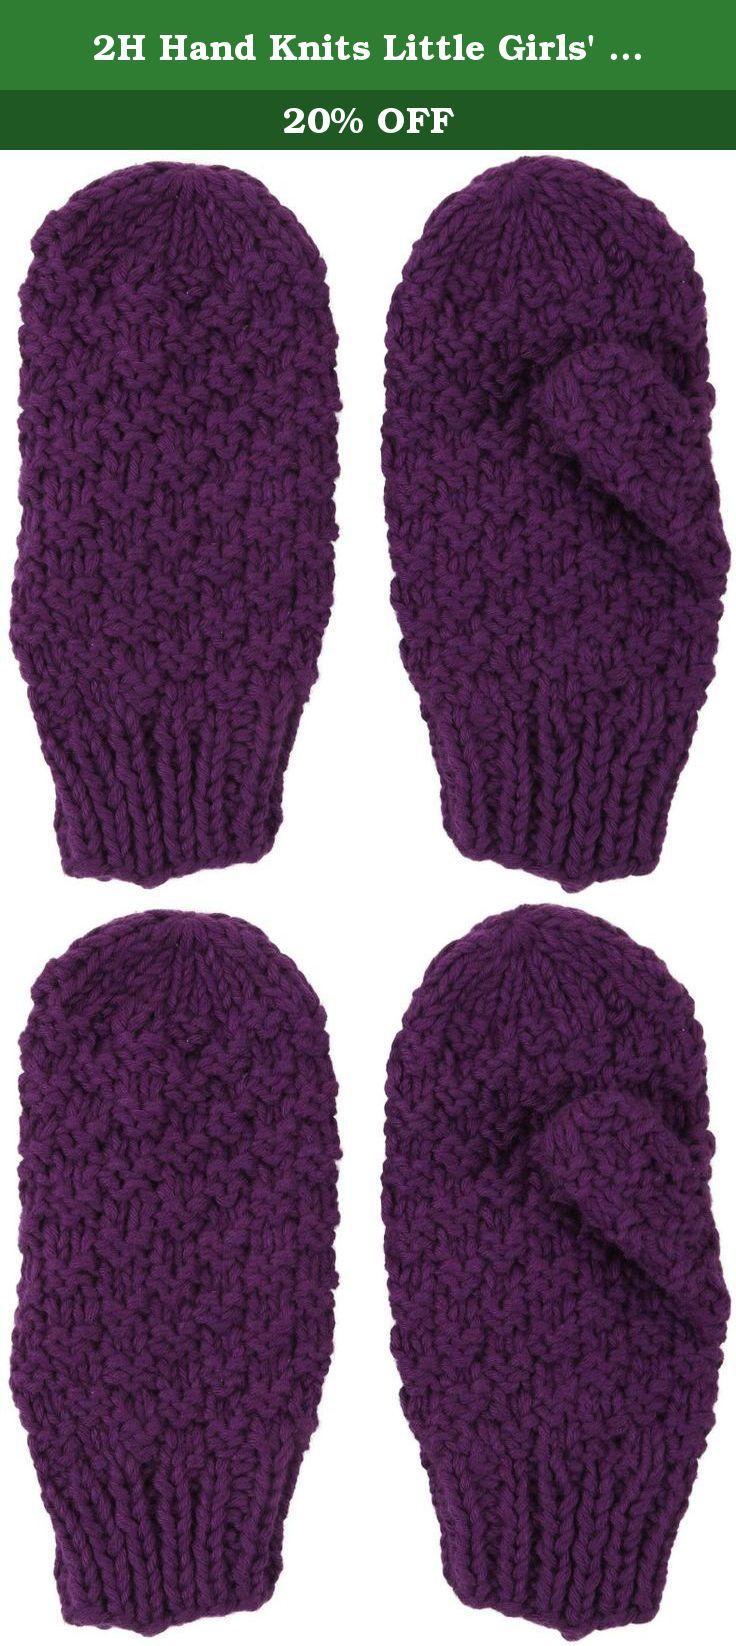 Seirus Toddler Boy//Girls Childsplay Insulated Durable Waterproof Glove Mittens